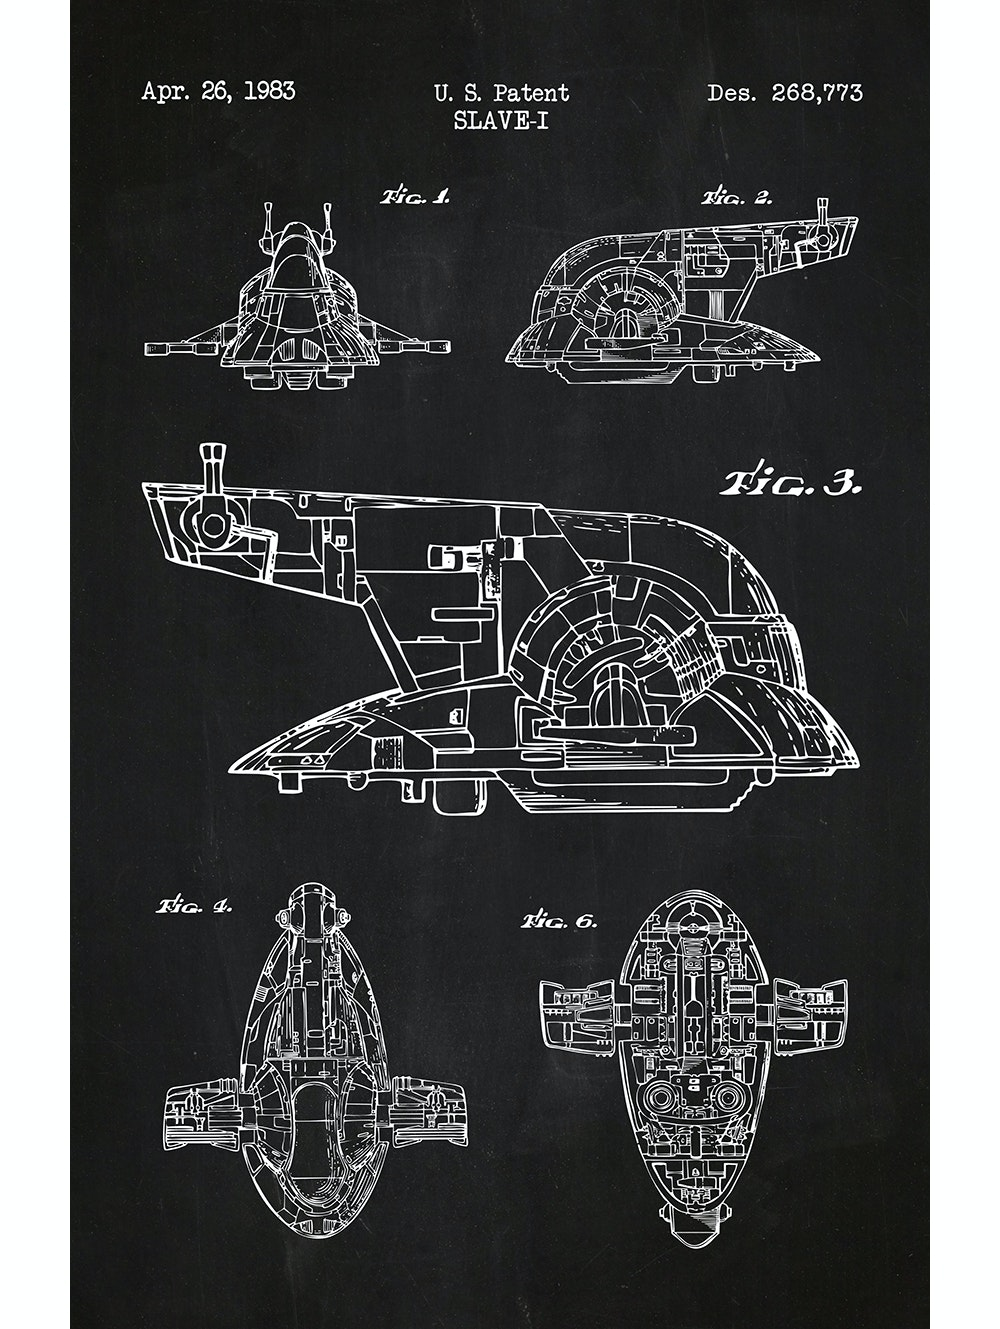 Star Wars - Slave I - 268,773